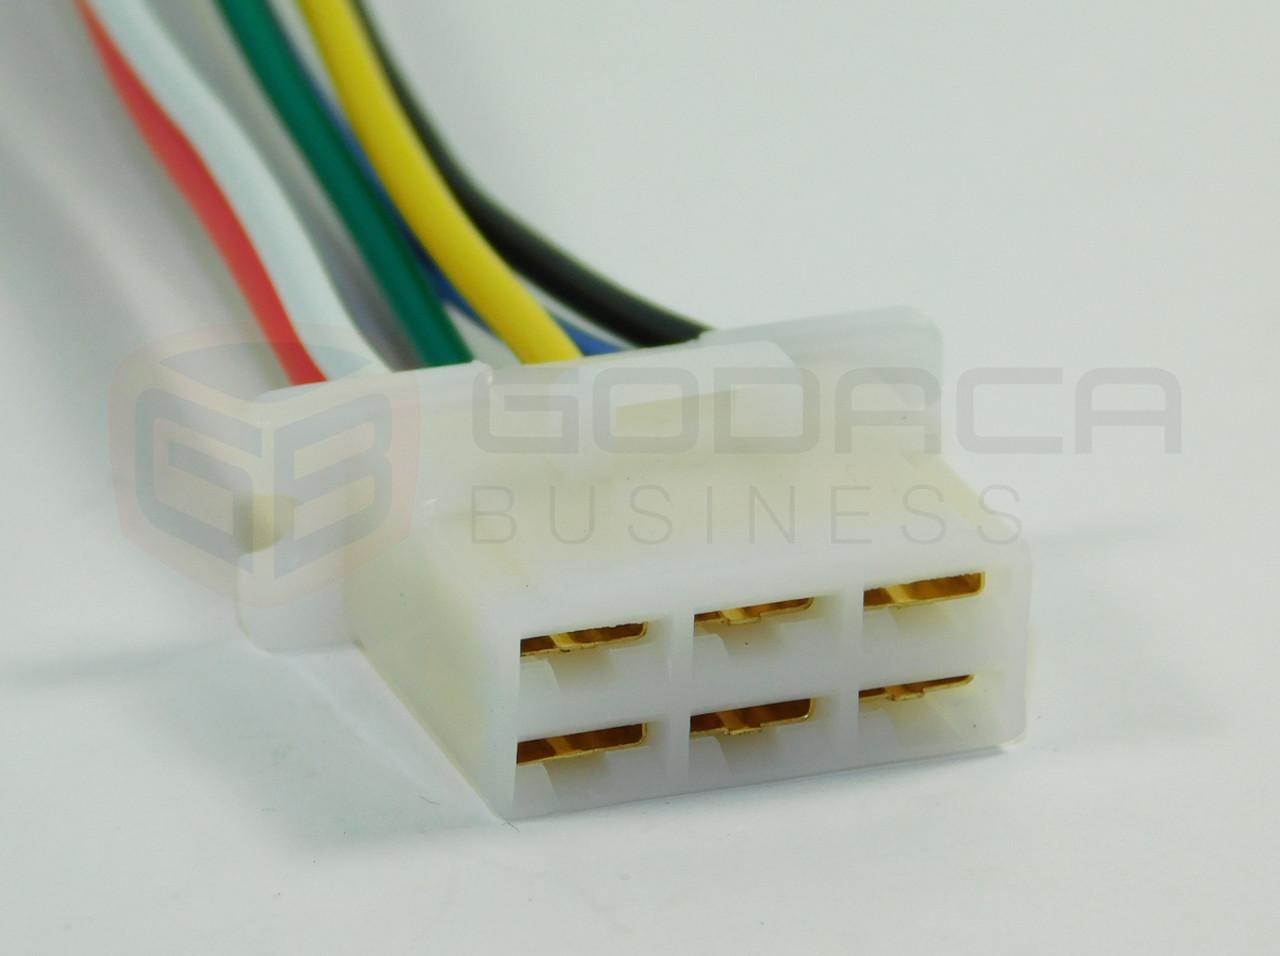 1x connector alternator plug repair harness 6 way 6pin socket female terminal gm [ 1280 x 956 Pixel ]